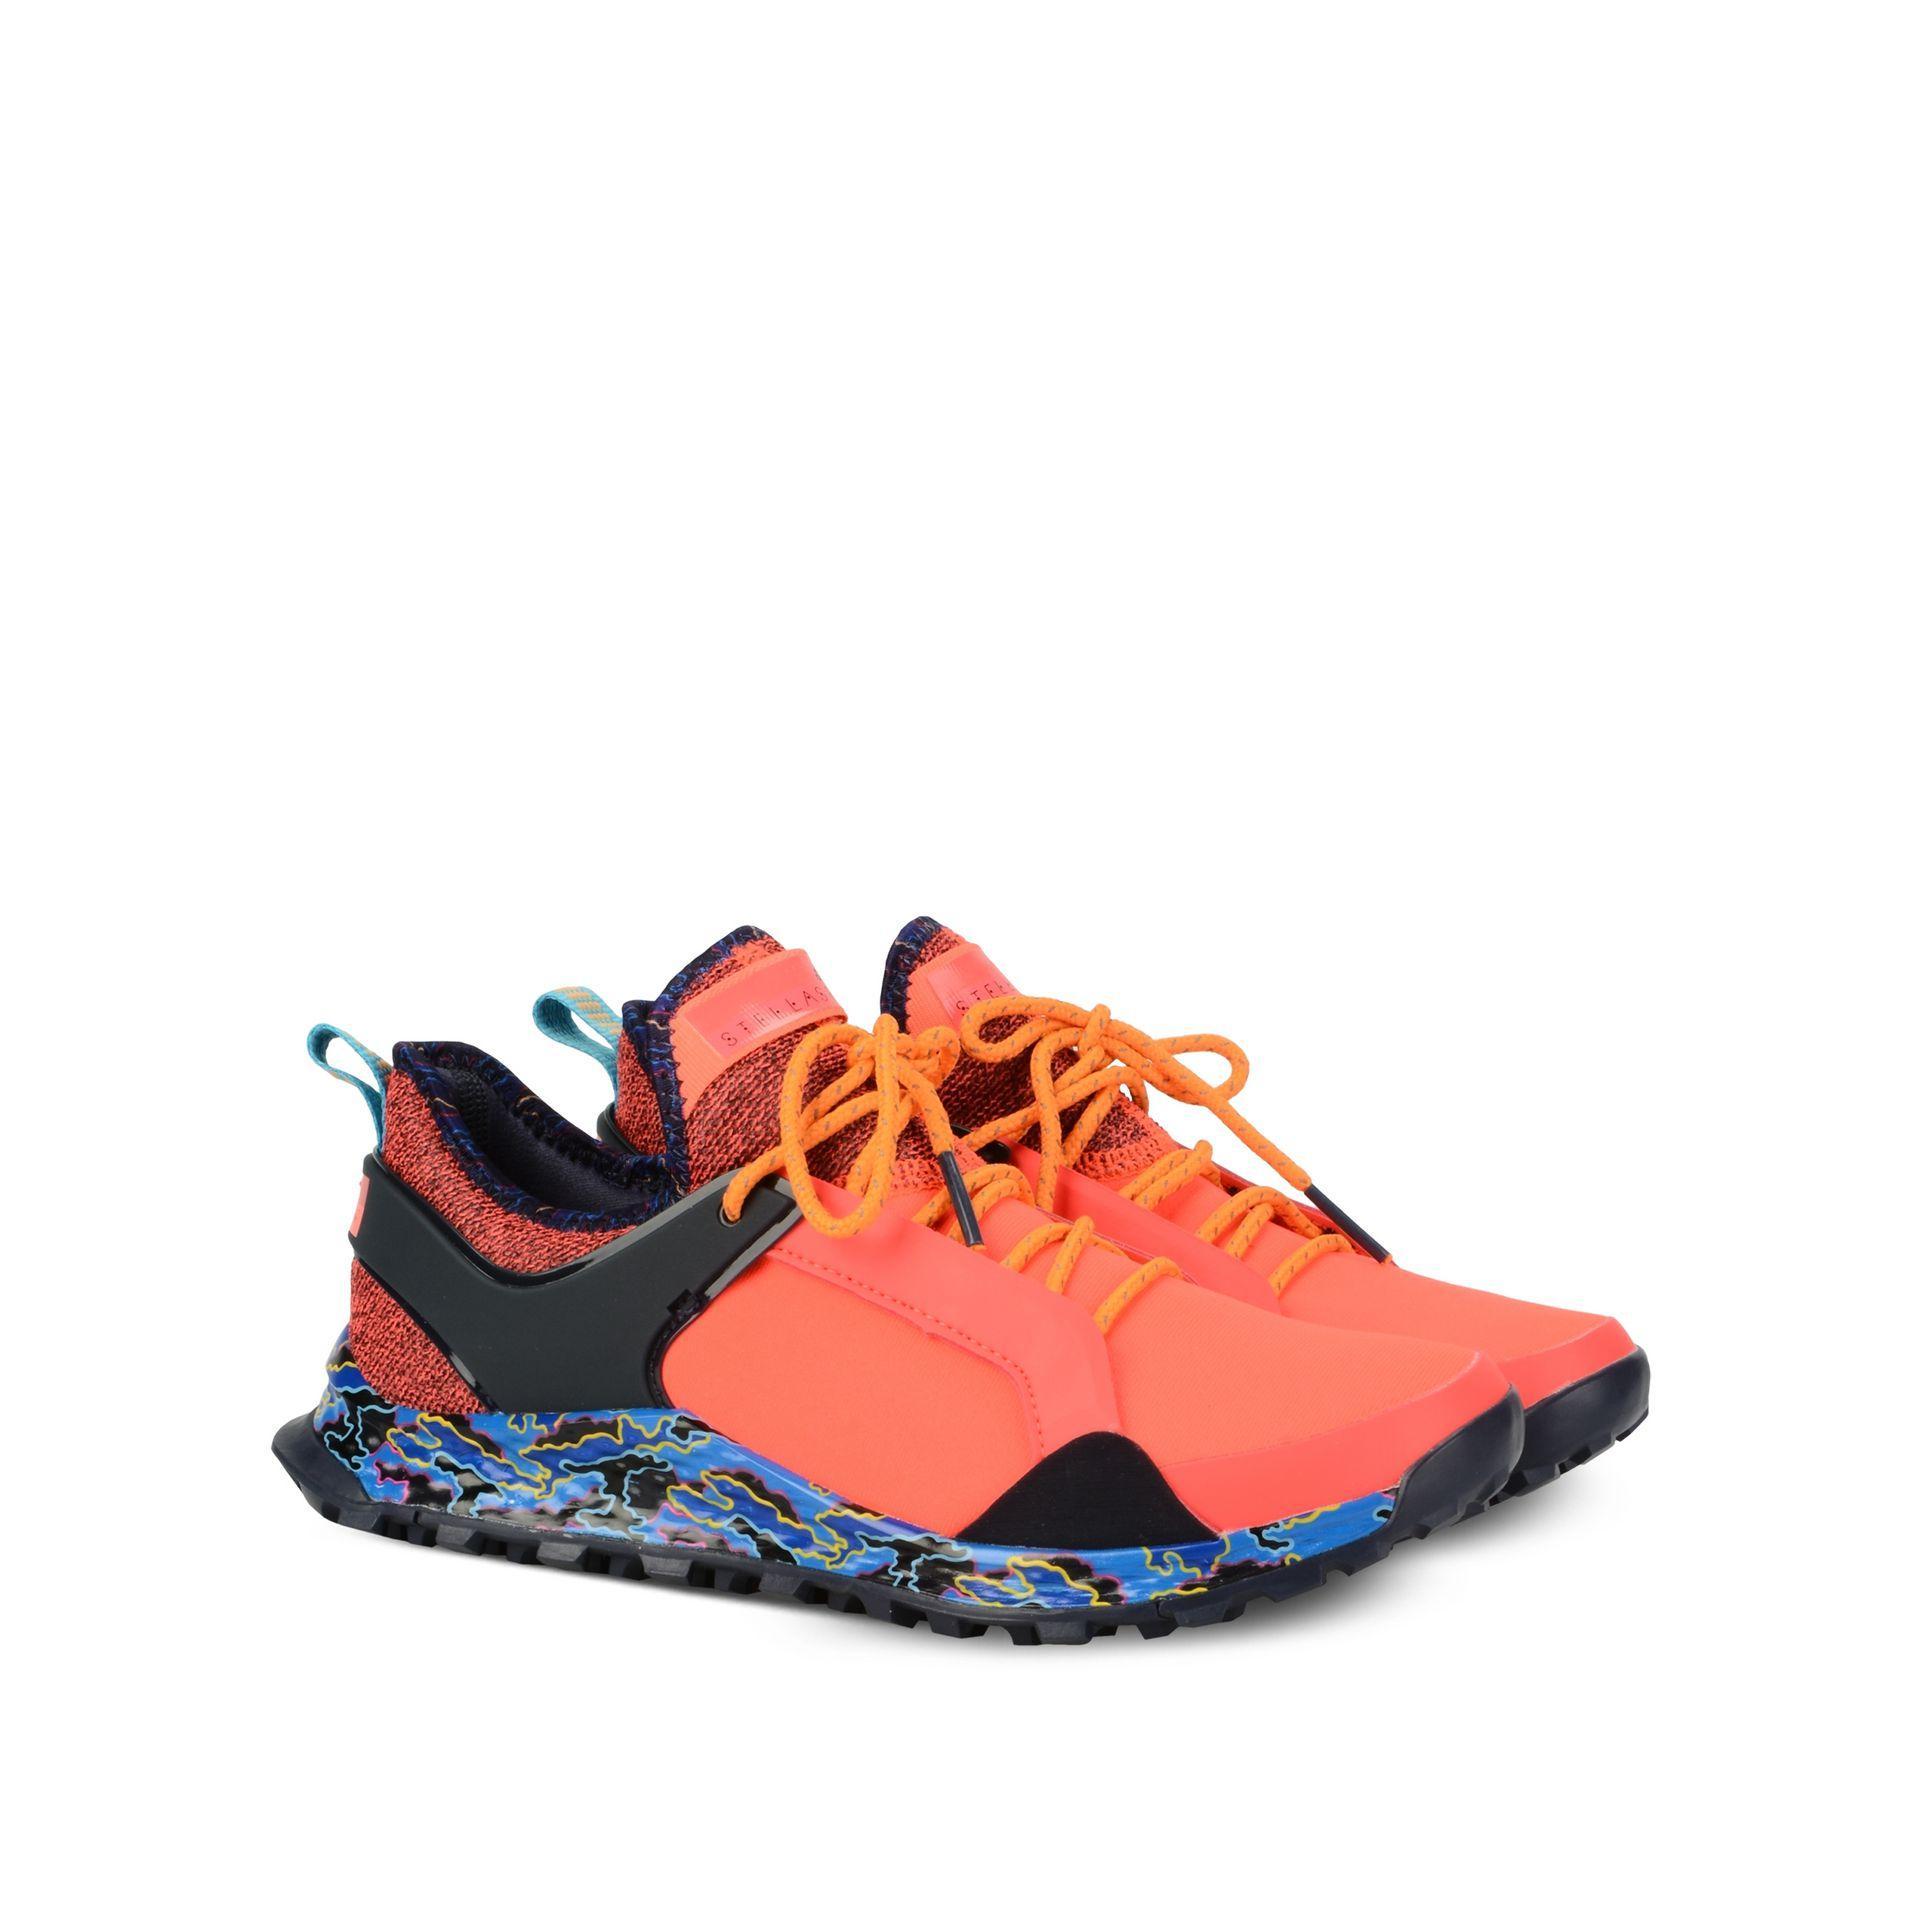 047548a30f2 Lyst - adidas By Stella McCartney Red Aleki X Running Shoes in Red